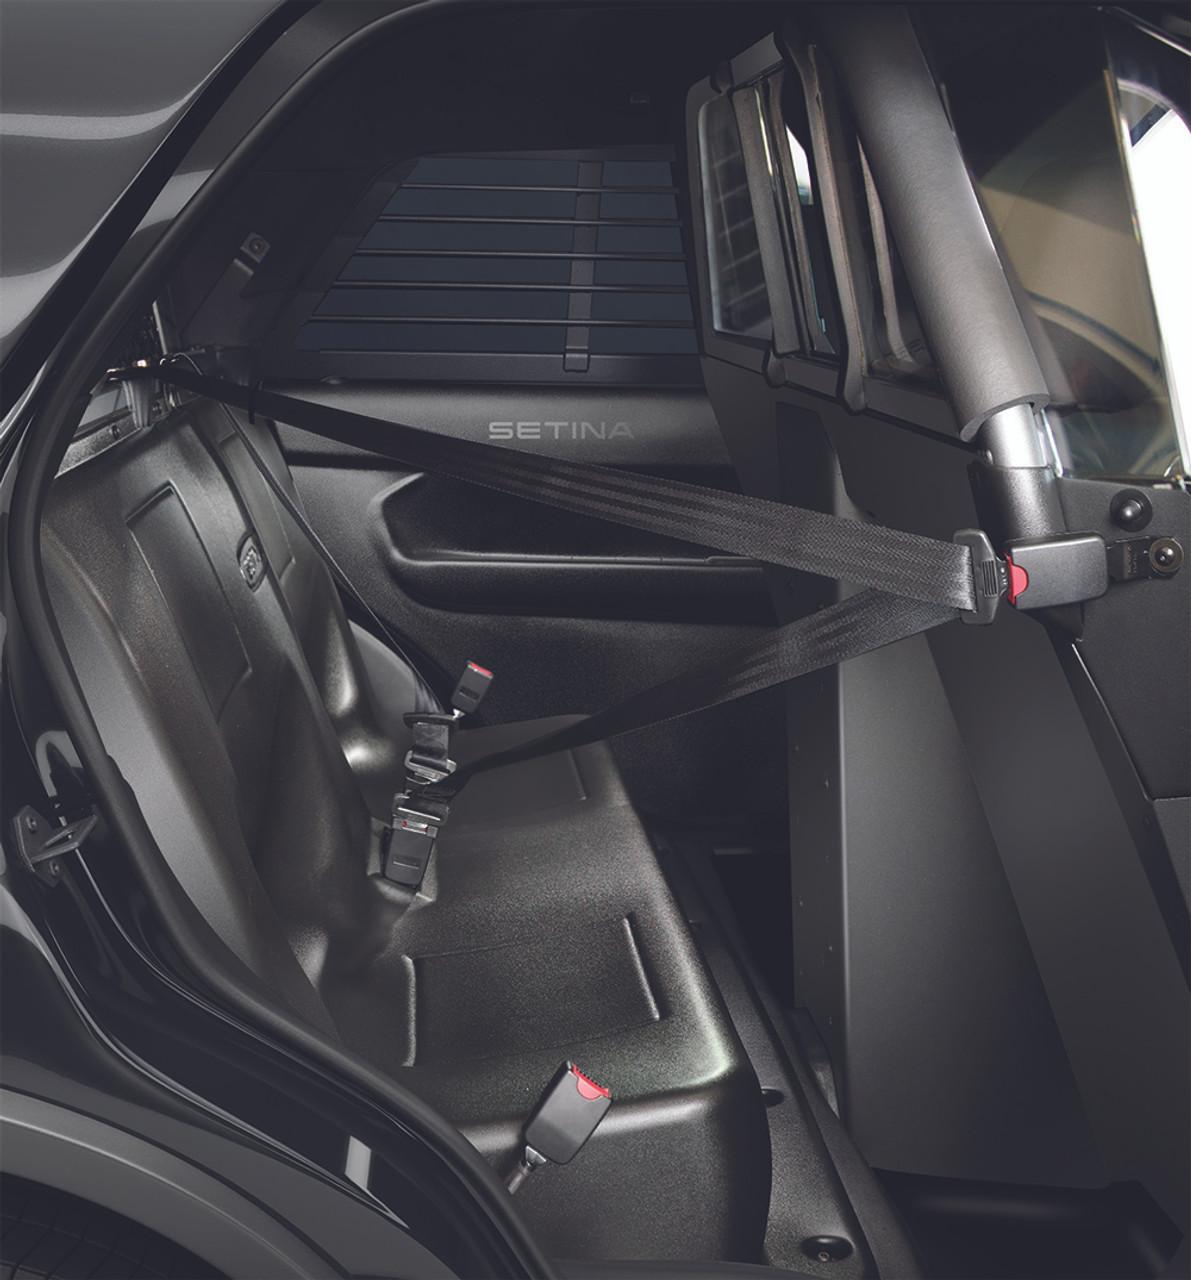 Setina Ford Interceptor SUV Utility (Explorer) 2013-2019 & 2020 Police  Prisoner Transport Rear Plastic Seat (OEM Replacement) includes Easy Access